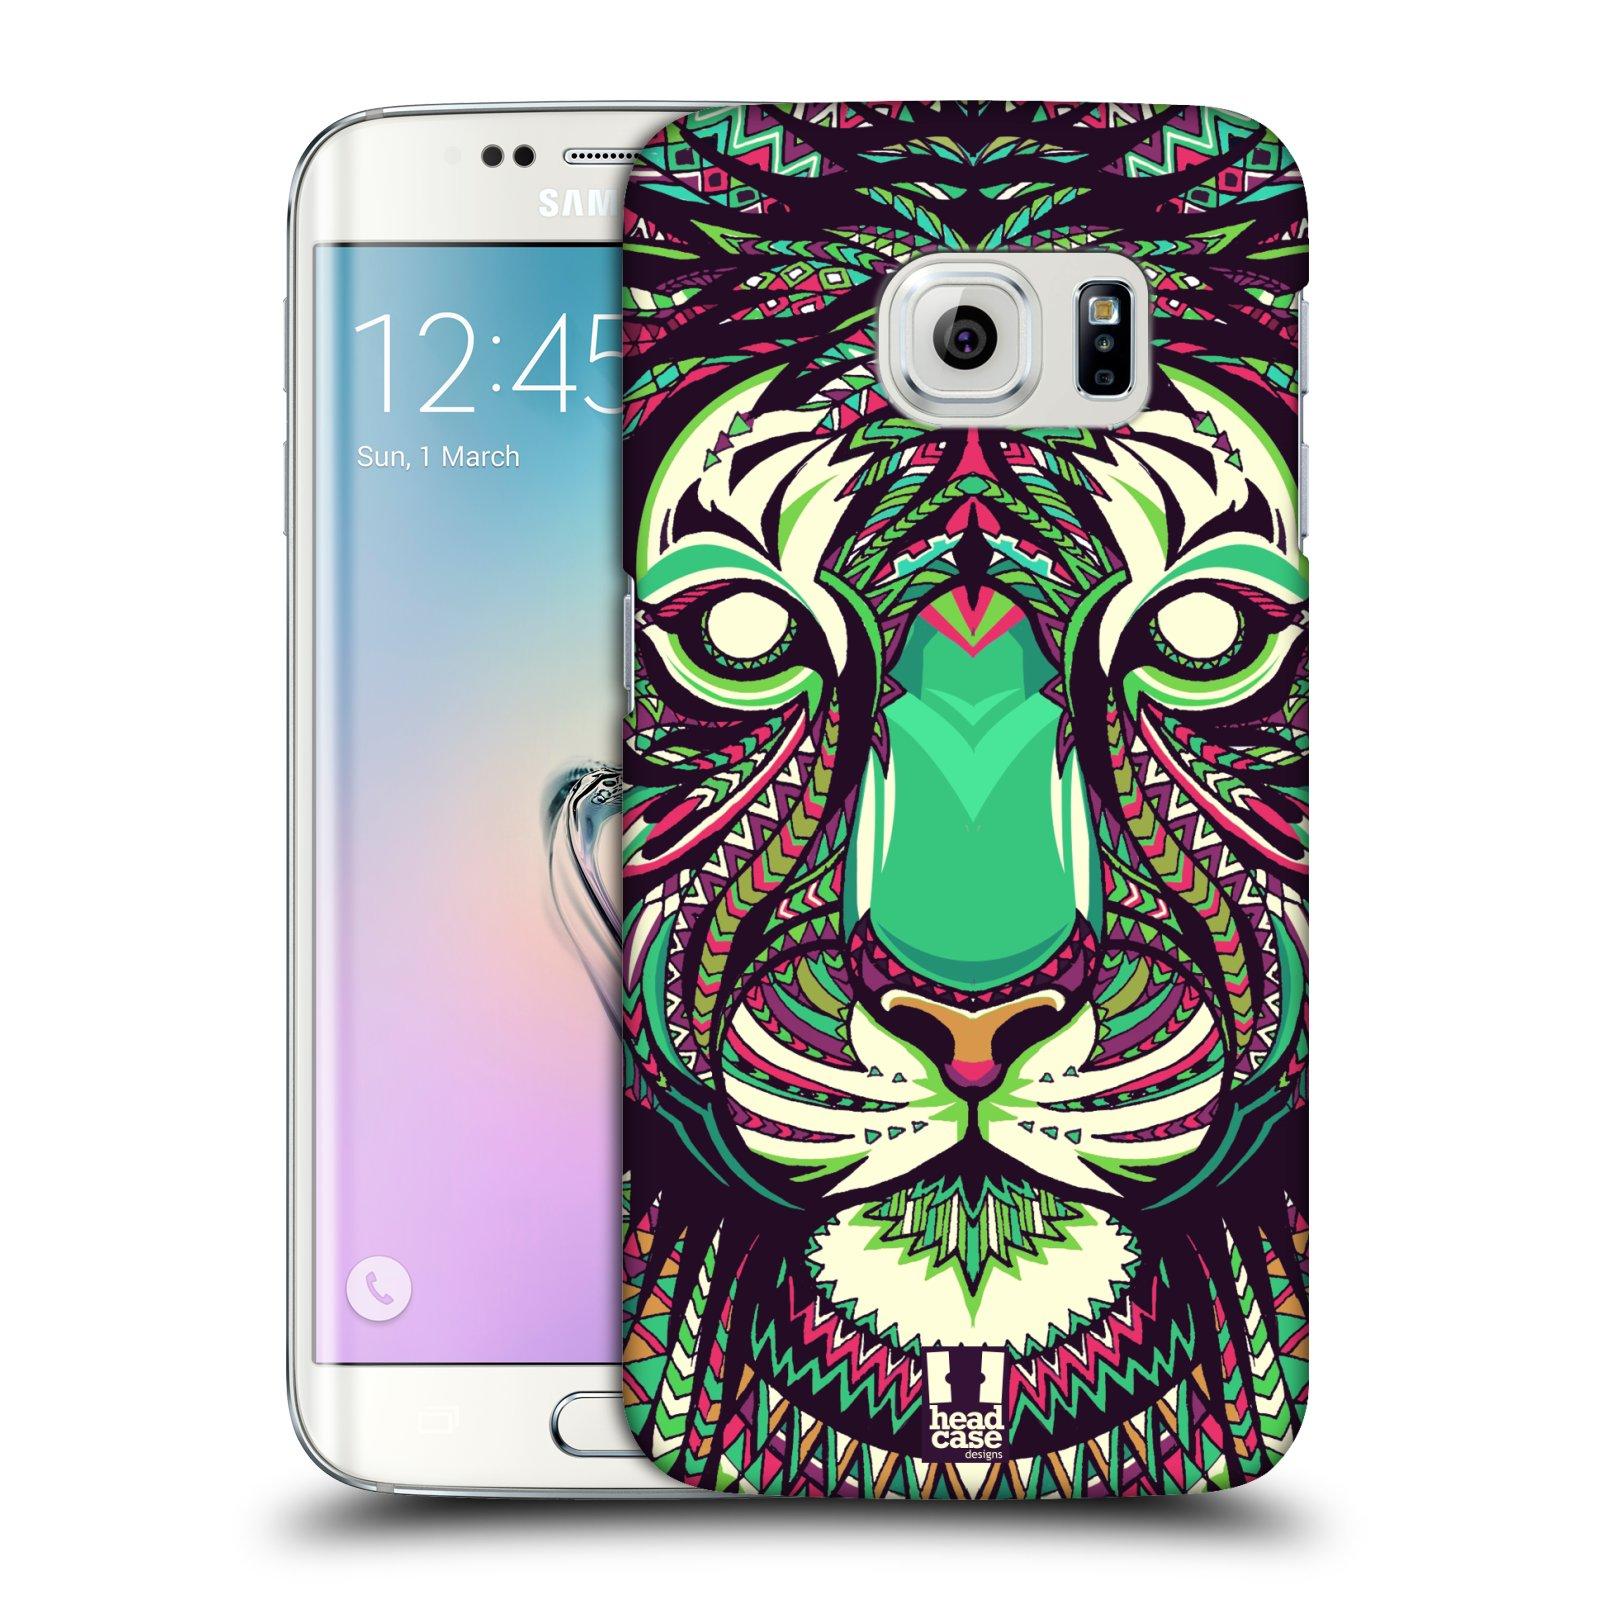 Plastové pouzdro na mobil Samsung Galaxy S6 Edge HEAD CASE AZTEC TYGR (Kryt či obal na mobilní telefon Samsung Galaxy S6 Edge SM-G925F)